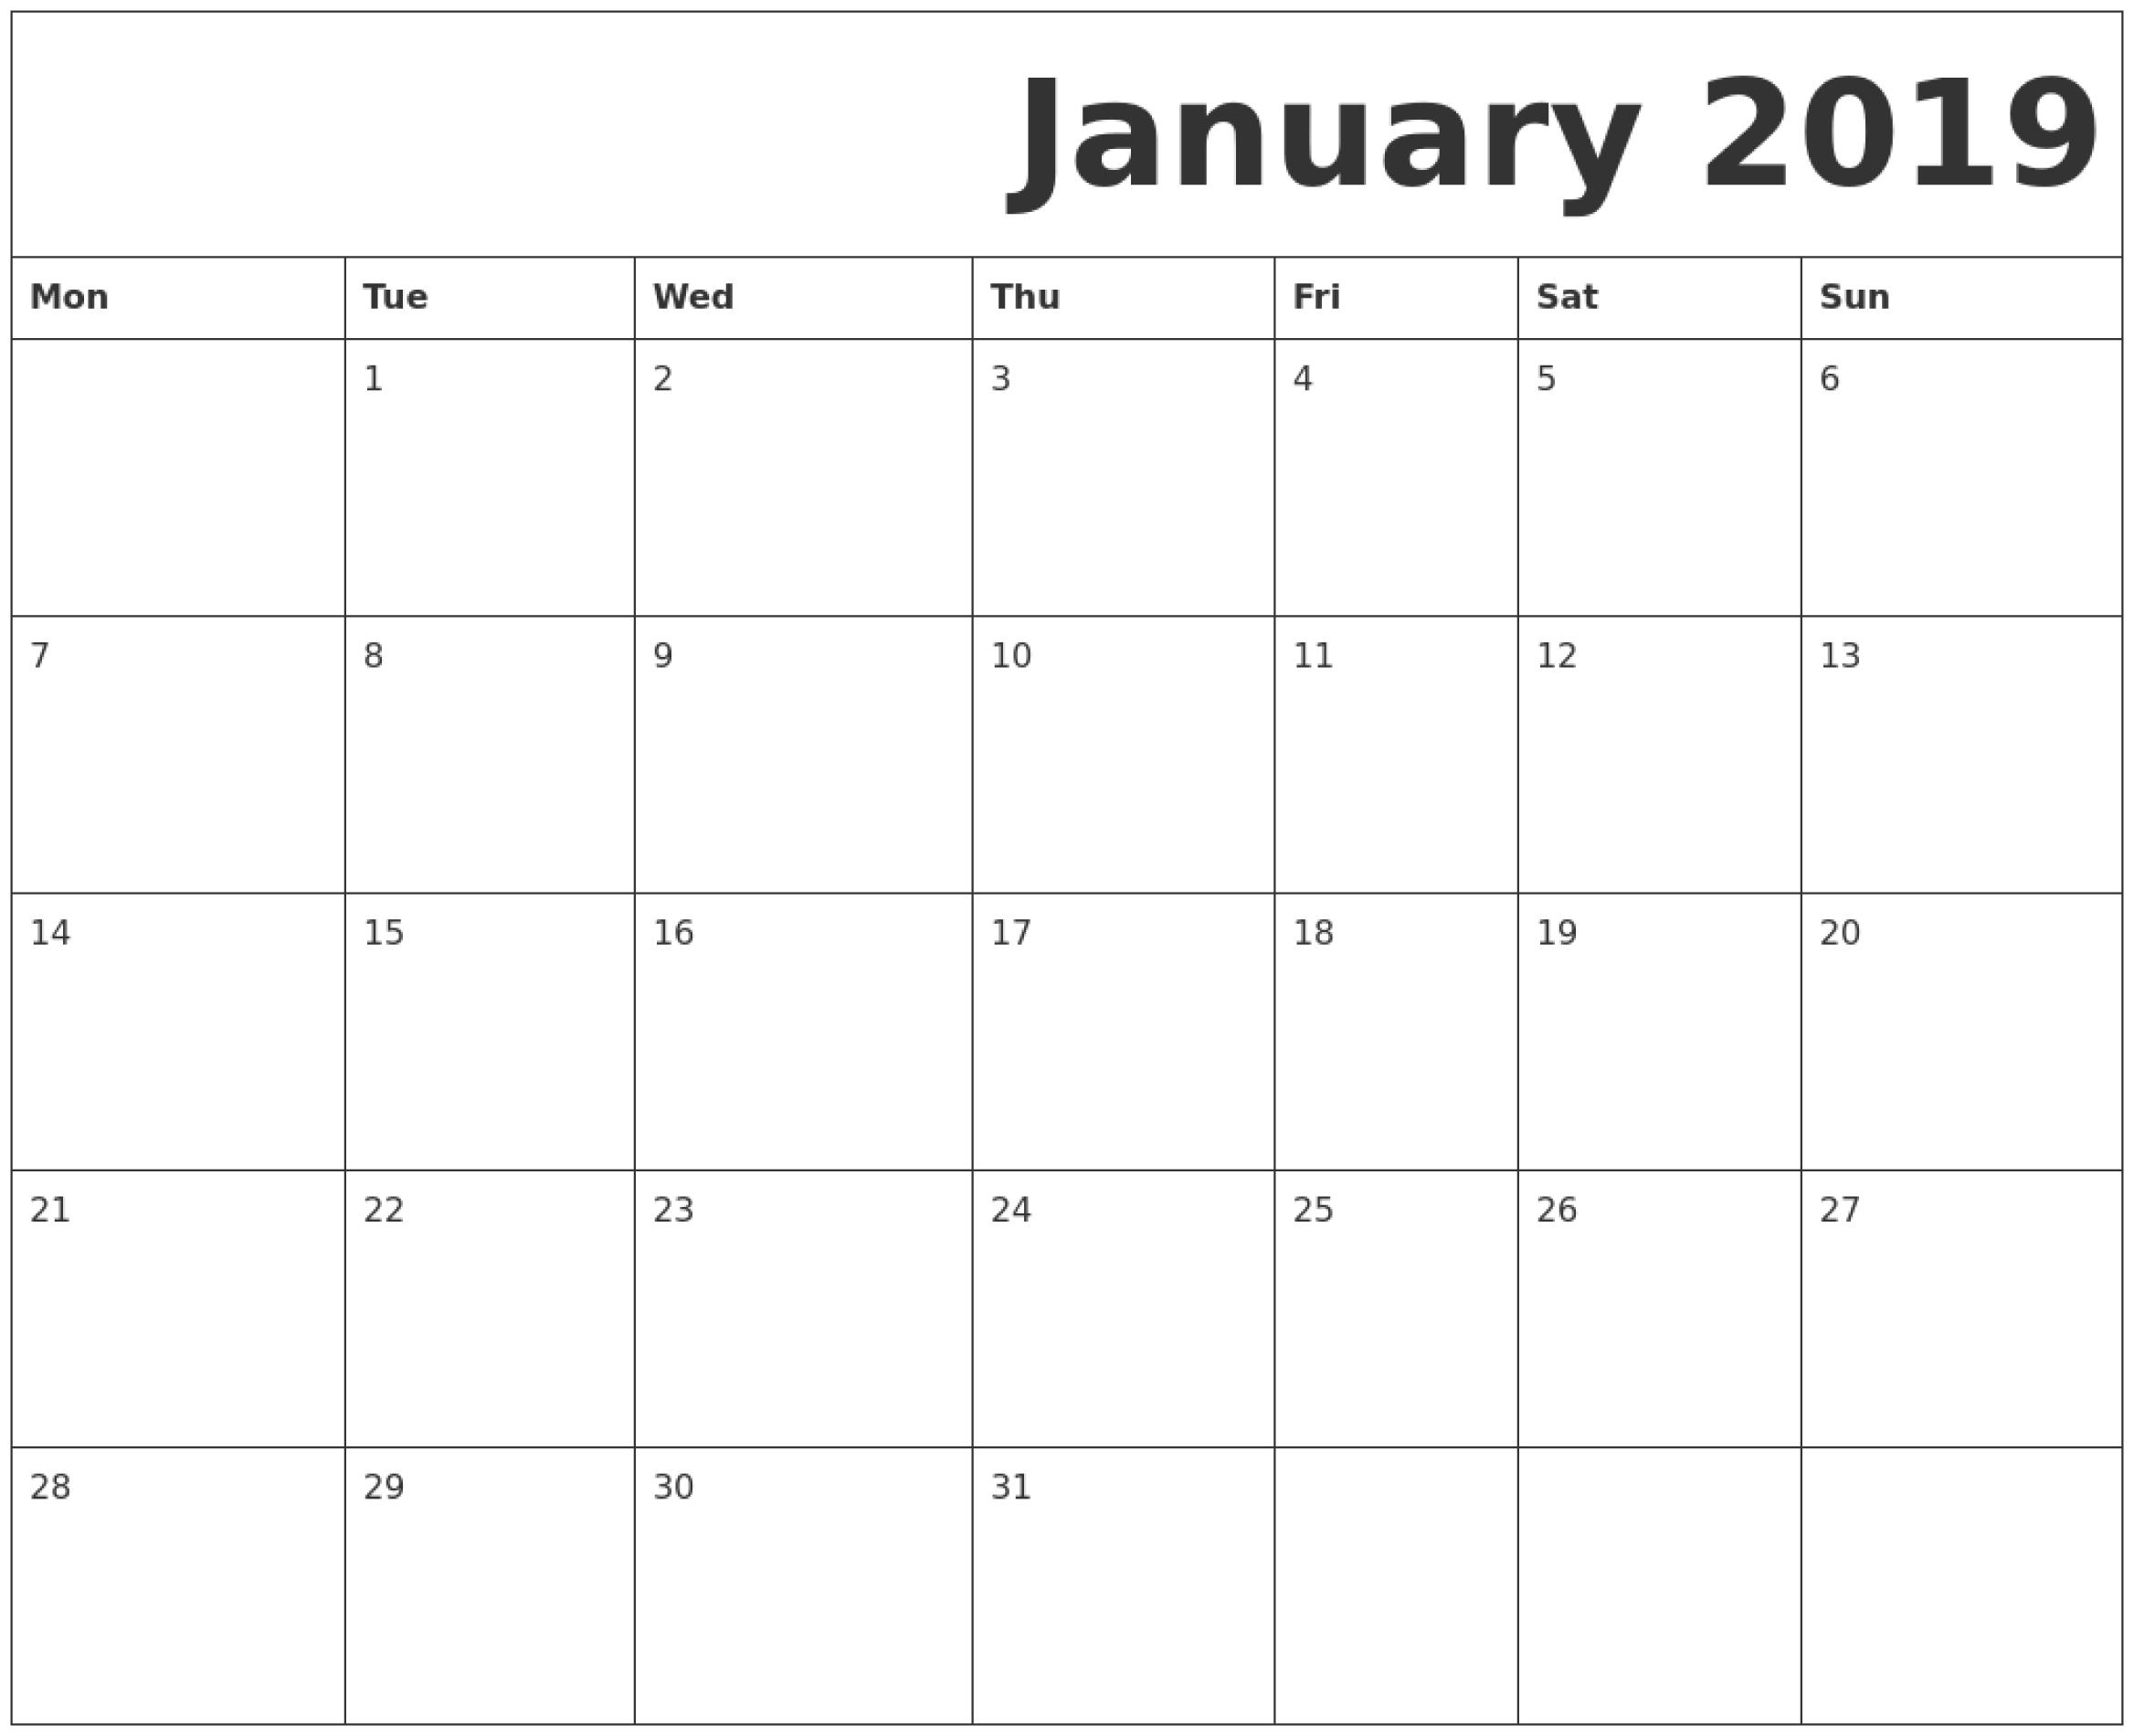 January 2019 Printable Calendar Monday Start. | January 2019